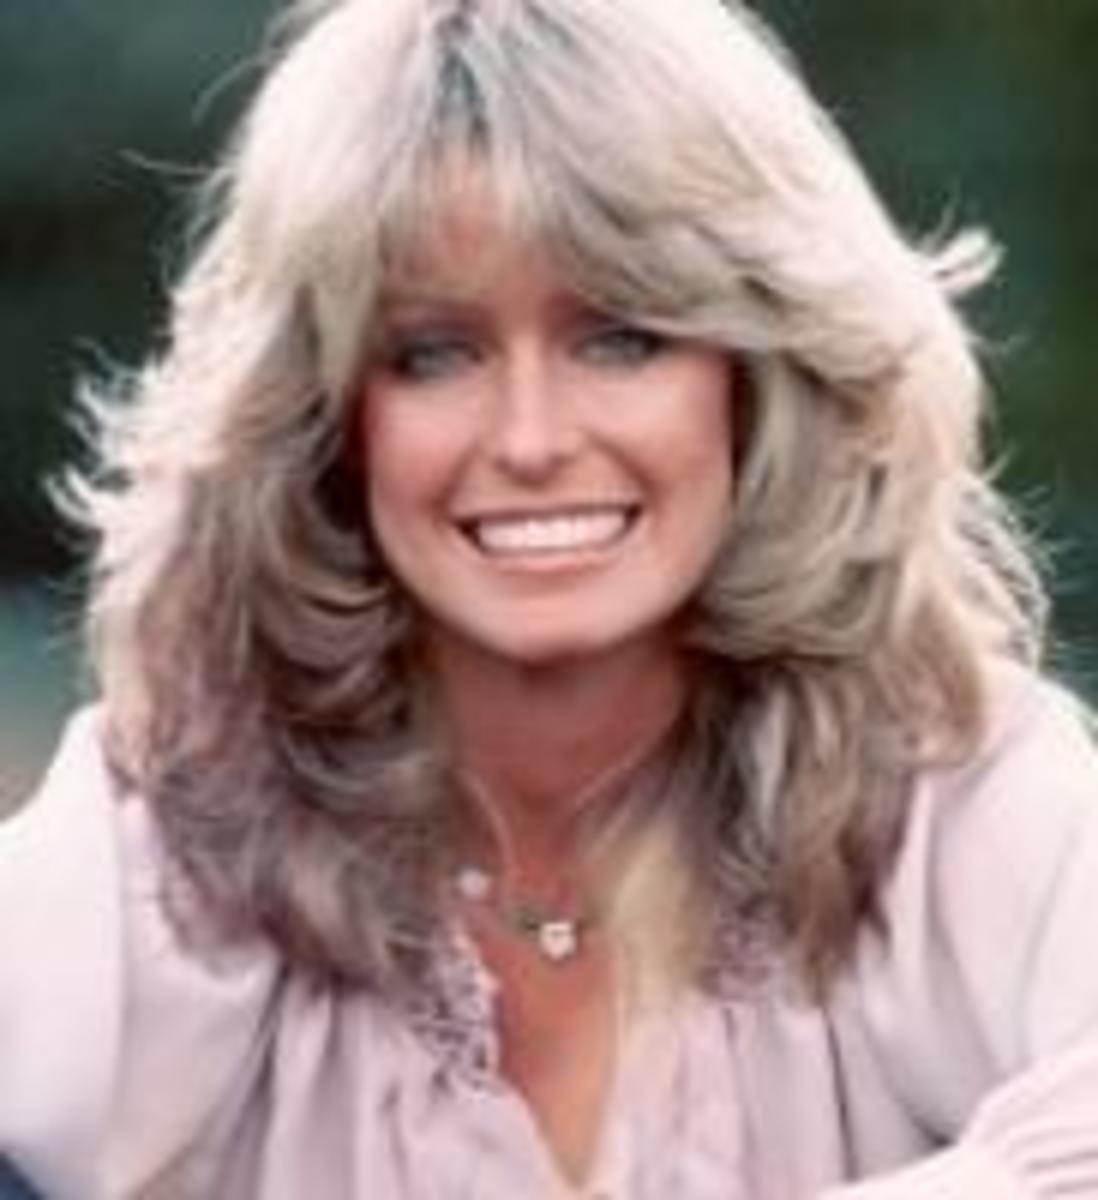 1970s Farrah Fawcett